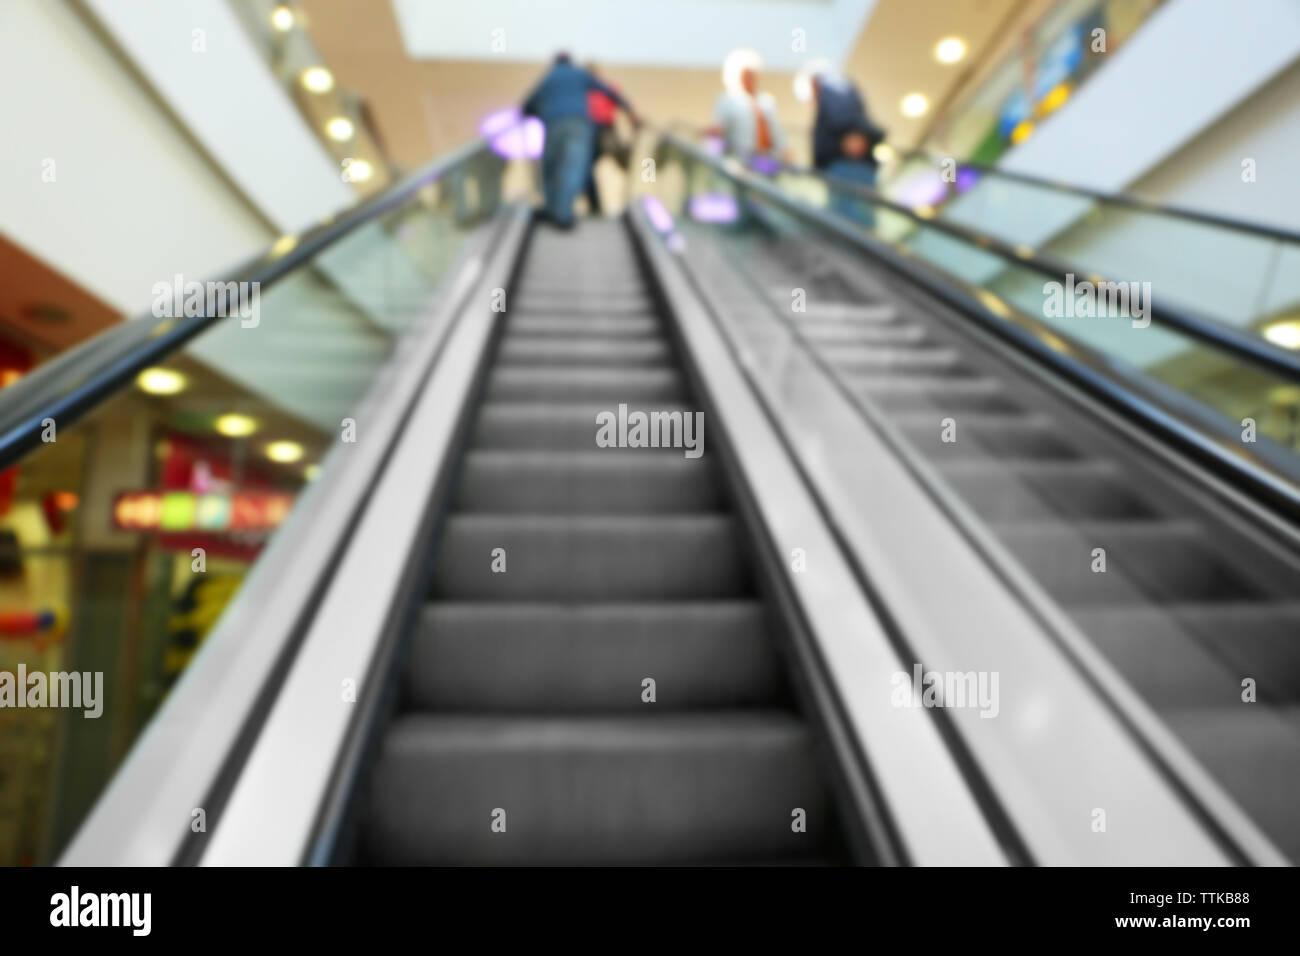 Modern escalator in the shopping mall Stock Photo